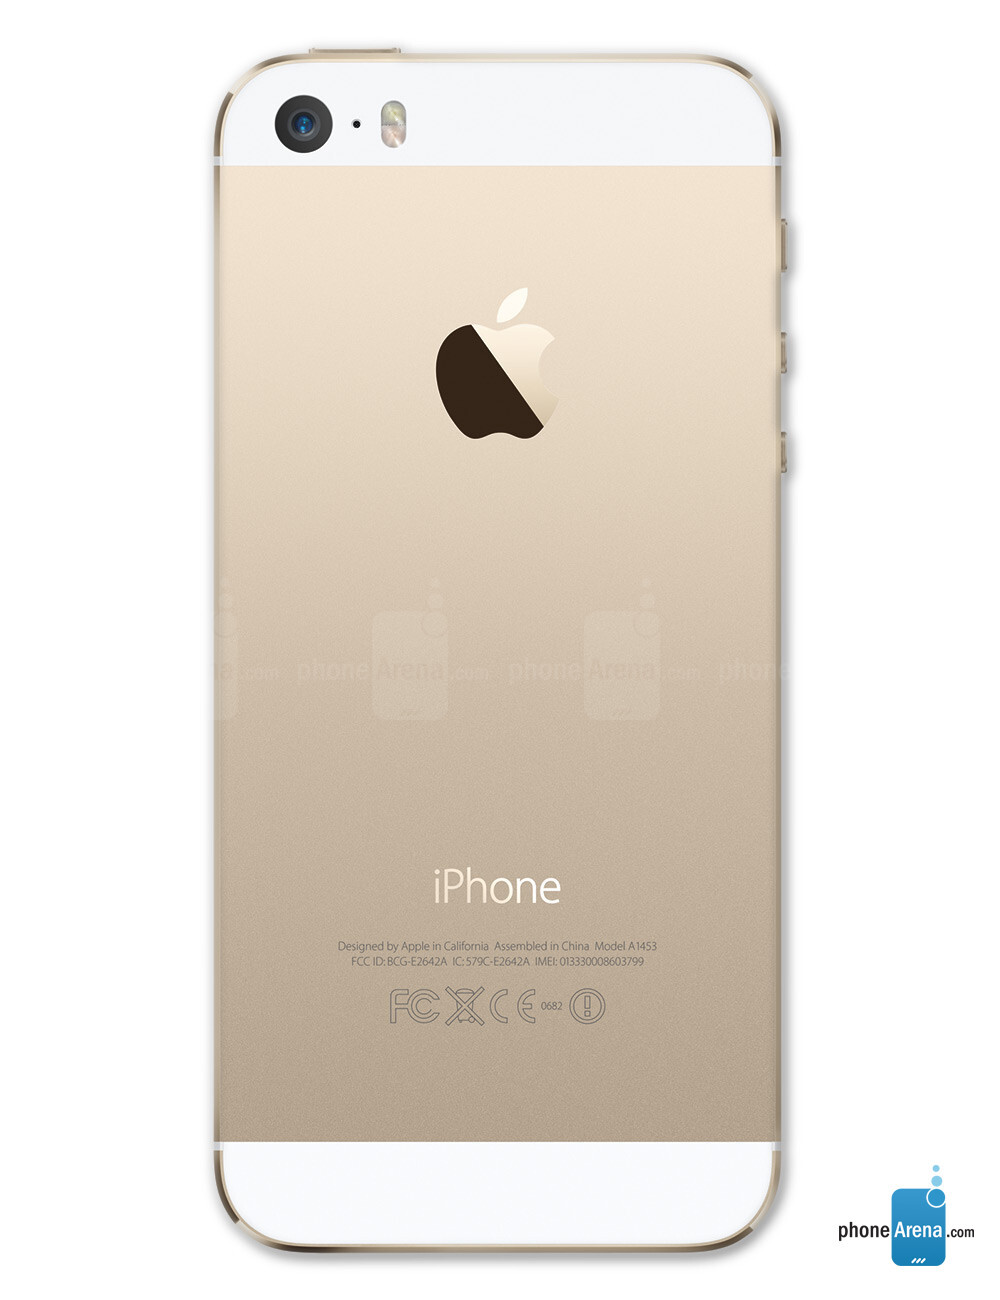 apple iphone 5s specs. Black Bedroom Furniture Sets. Home Design Ideas